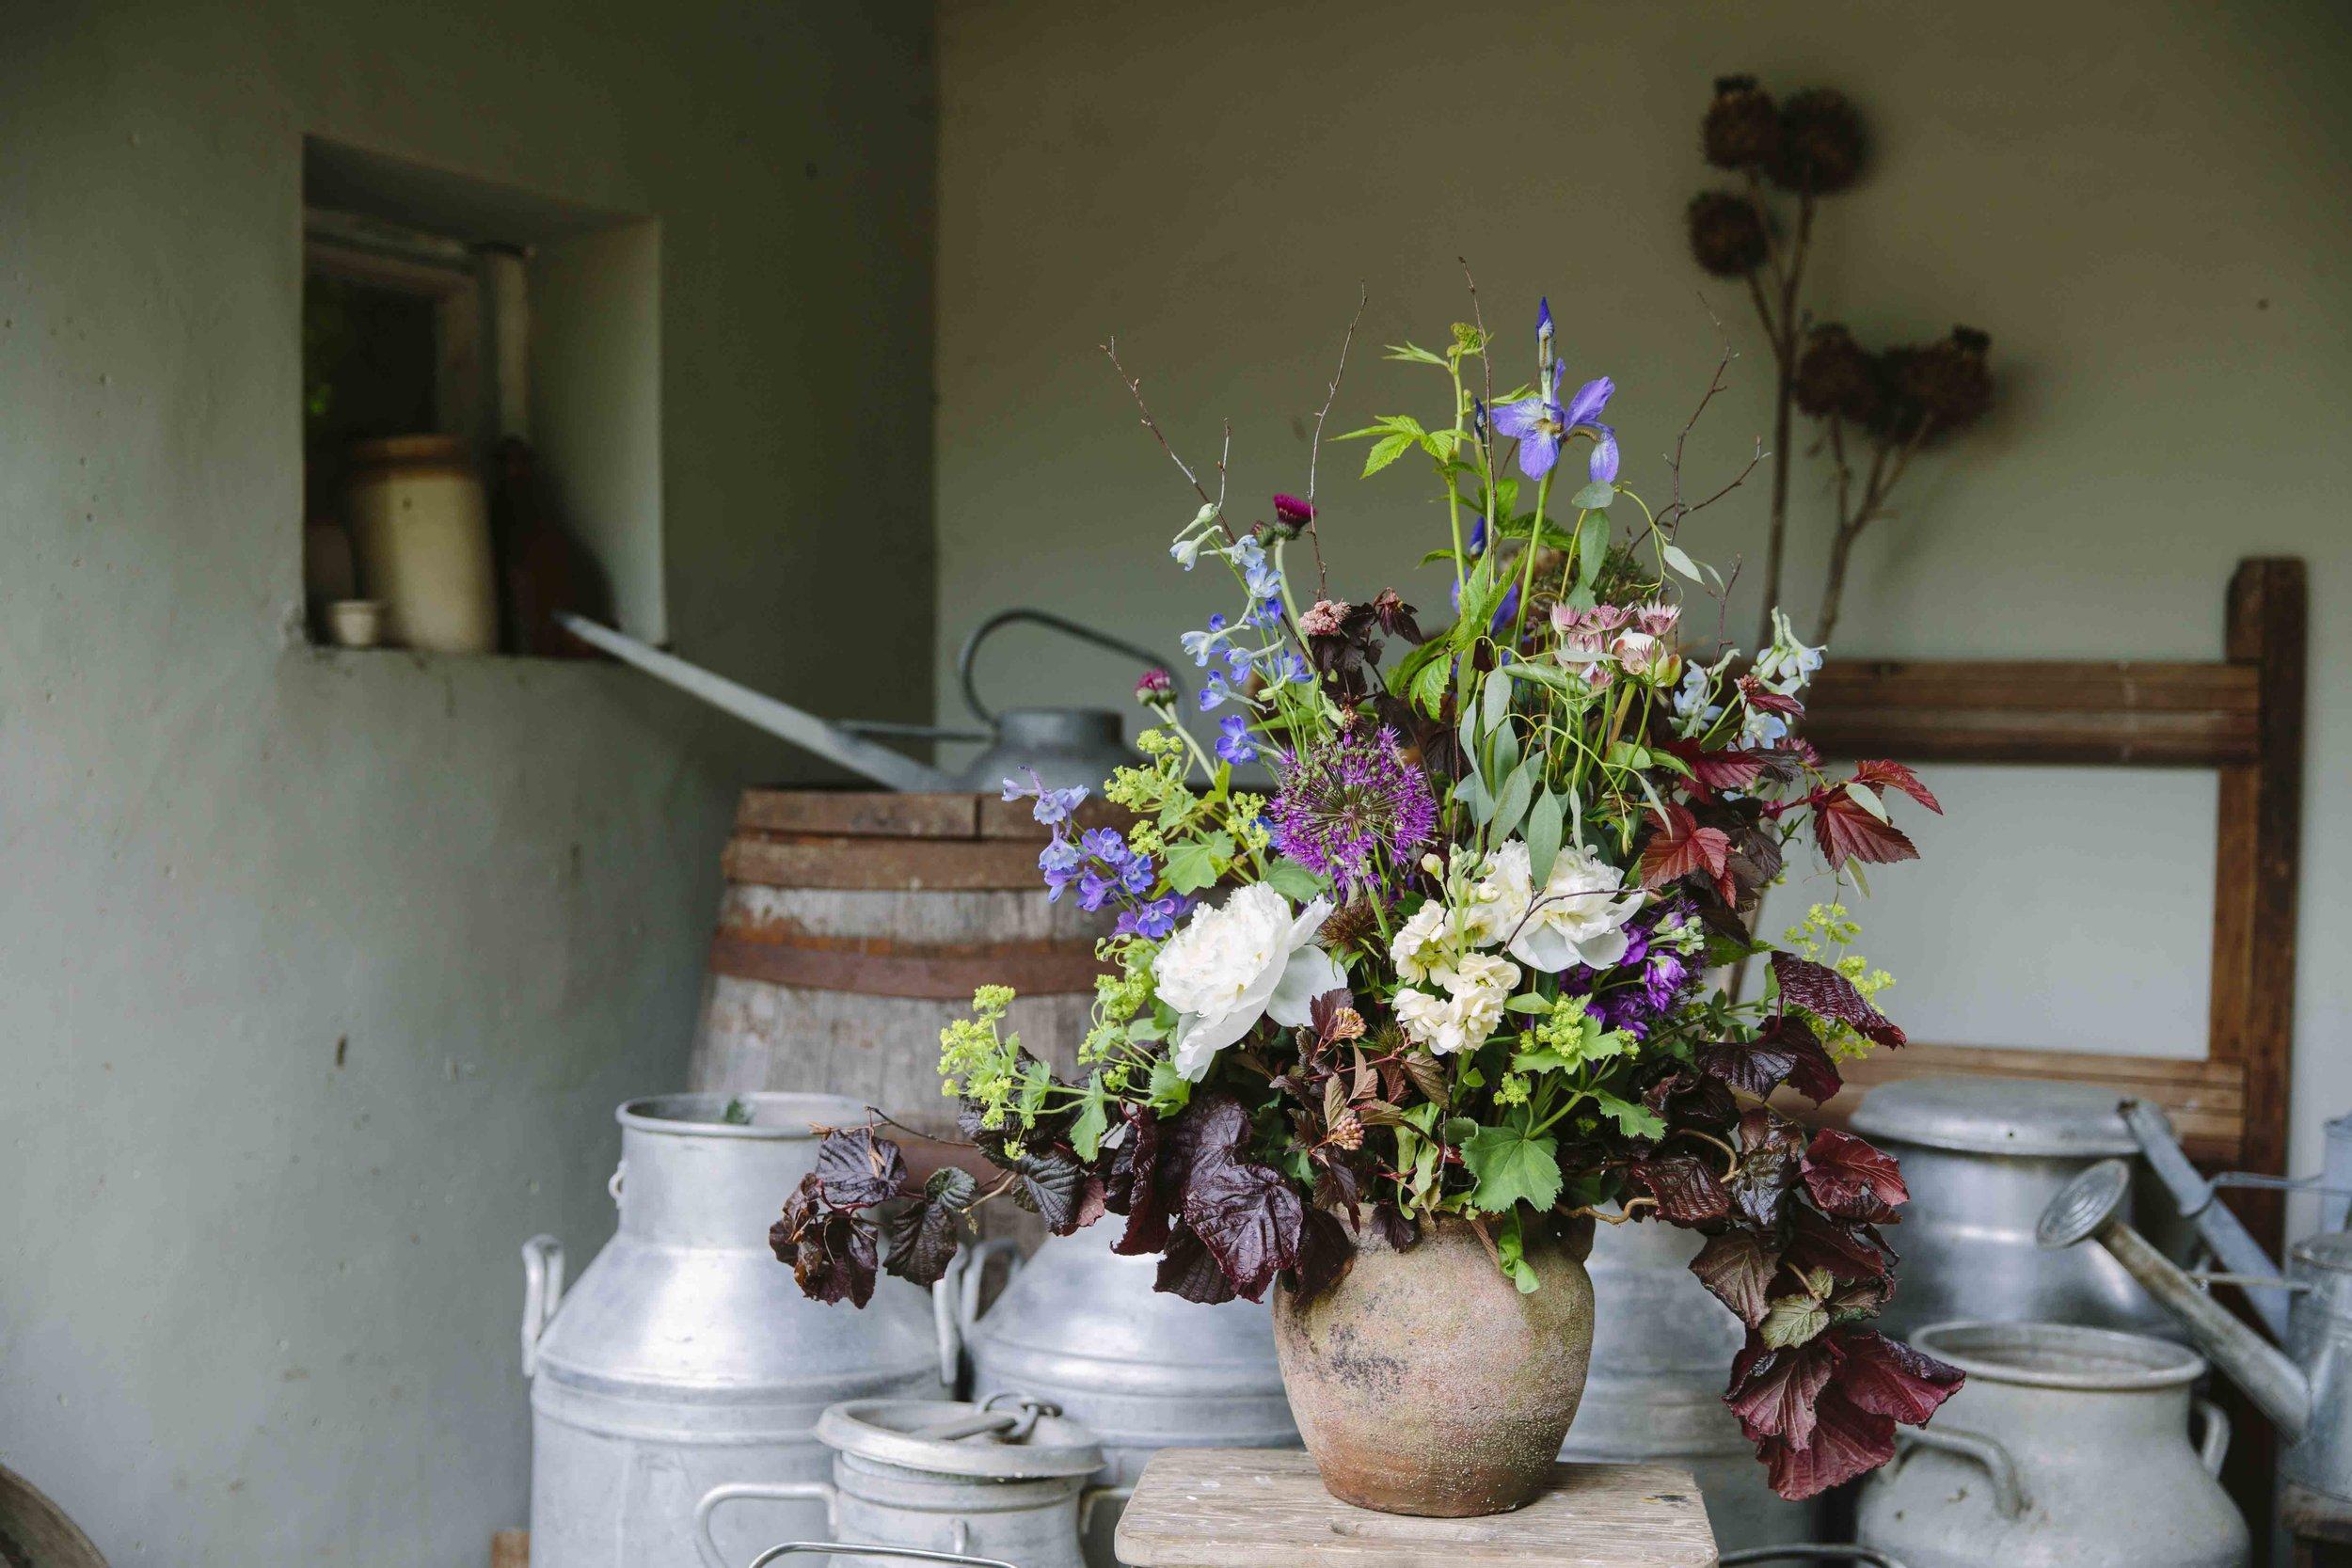 Yorkshire_Dales_Flower_Company_workshop_57.jpg